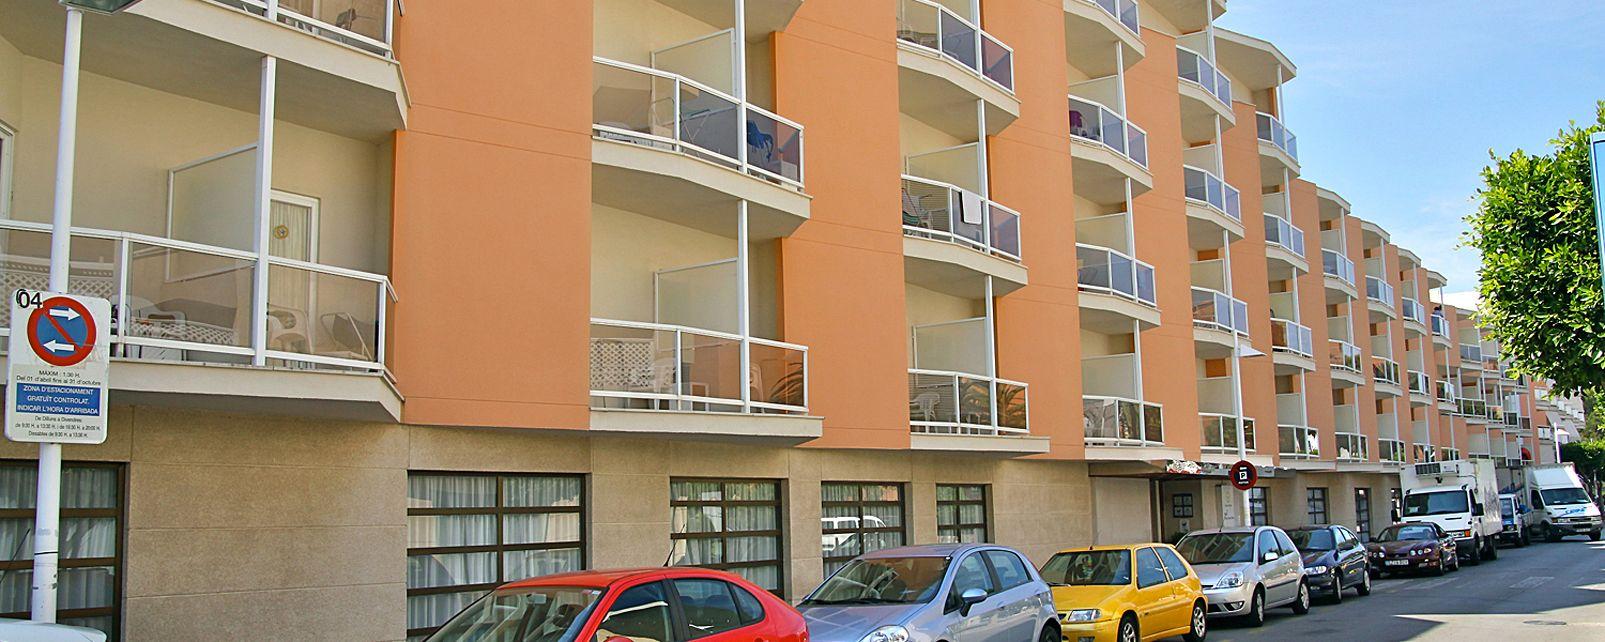 Hotel Globales Playa Santa Ponça